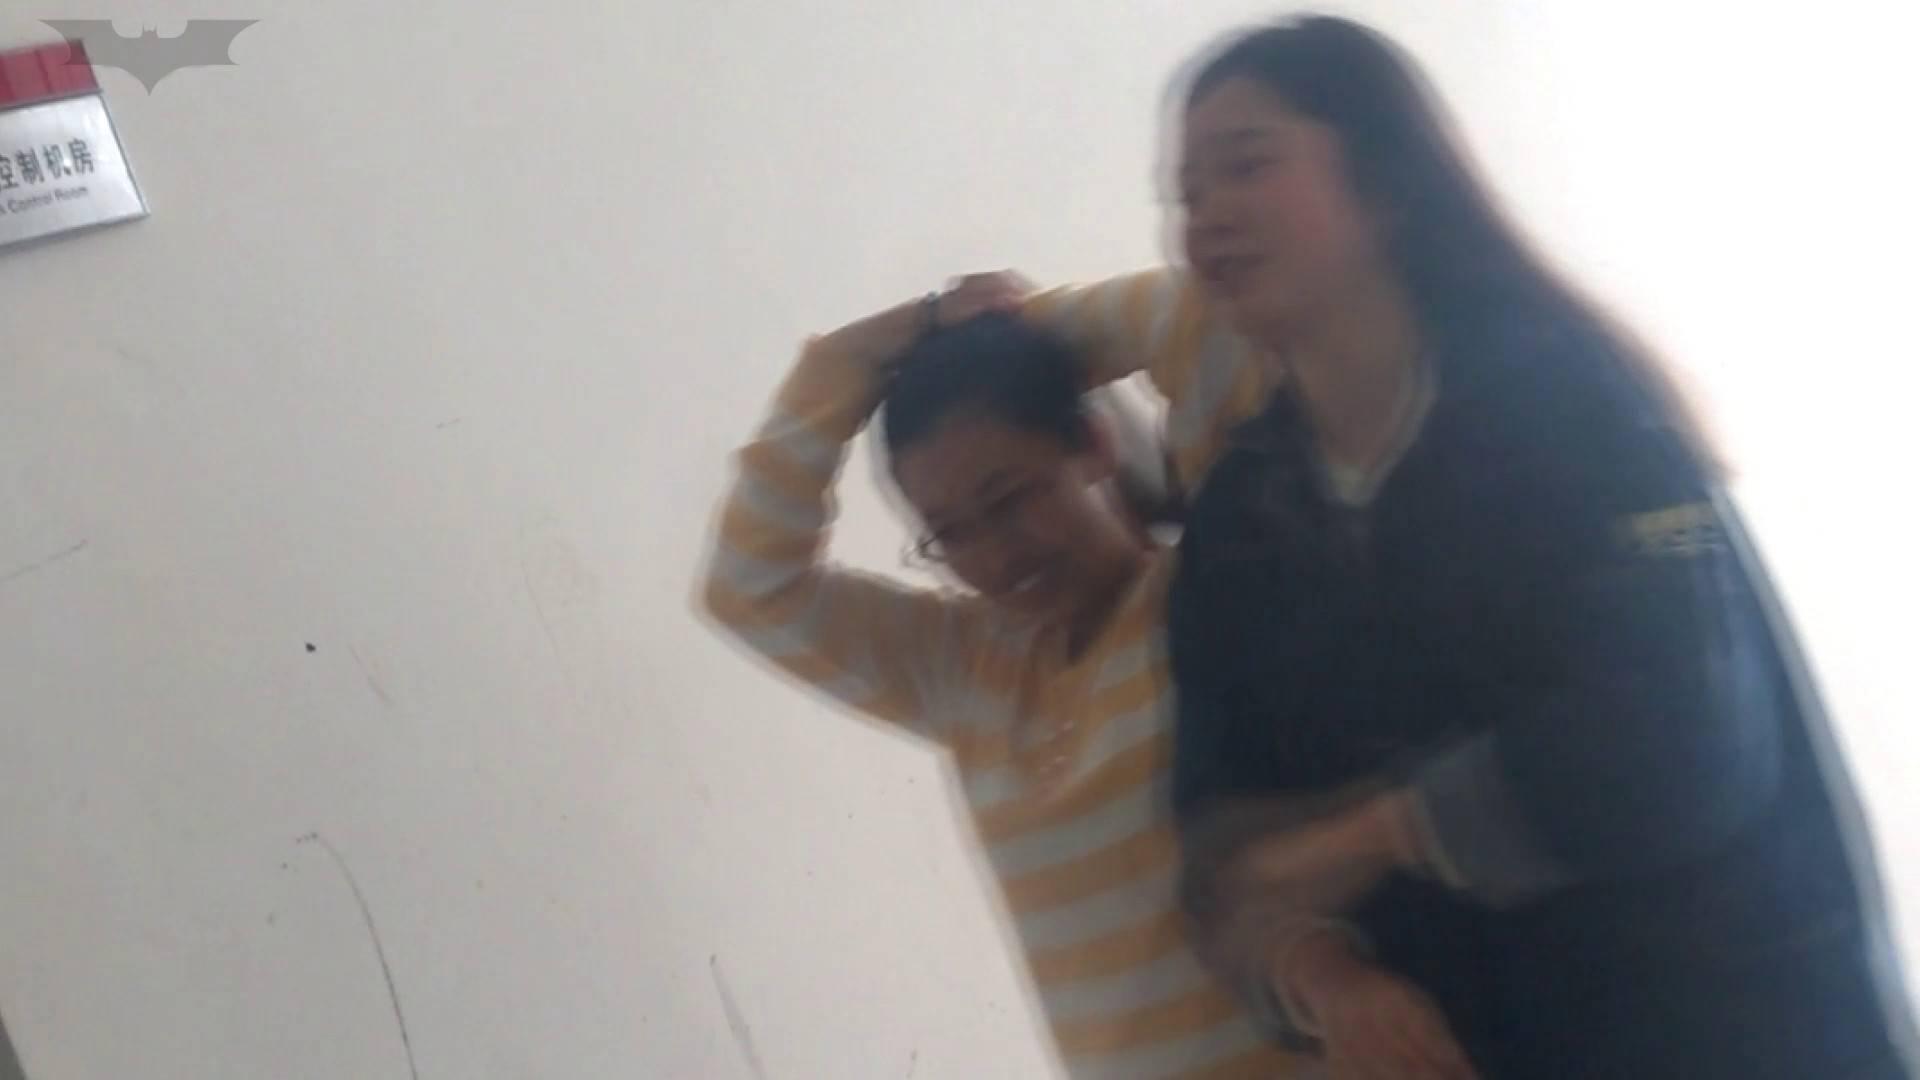 JD盗撮 美女の洗面所の秘密 Vol.05 Hな美女 ヌード画像 107pic 103